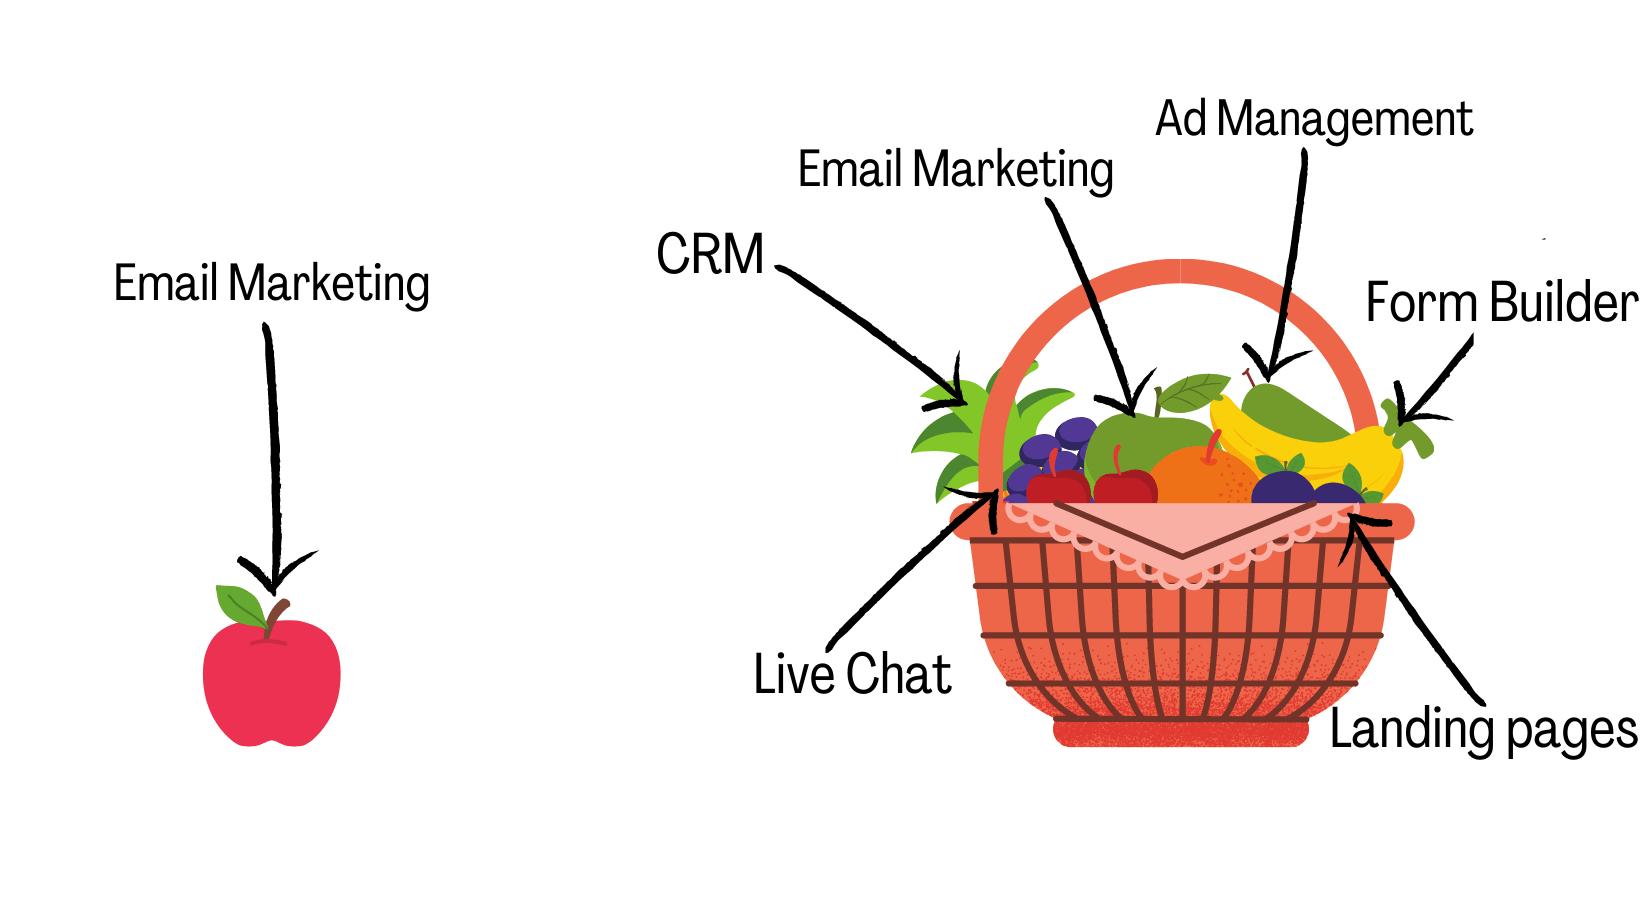 apple compared to fruit basket marketing tool analogy